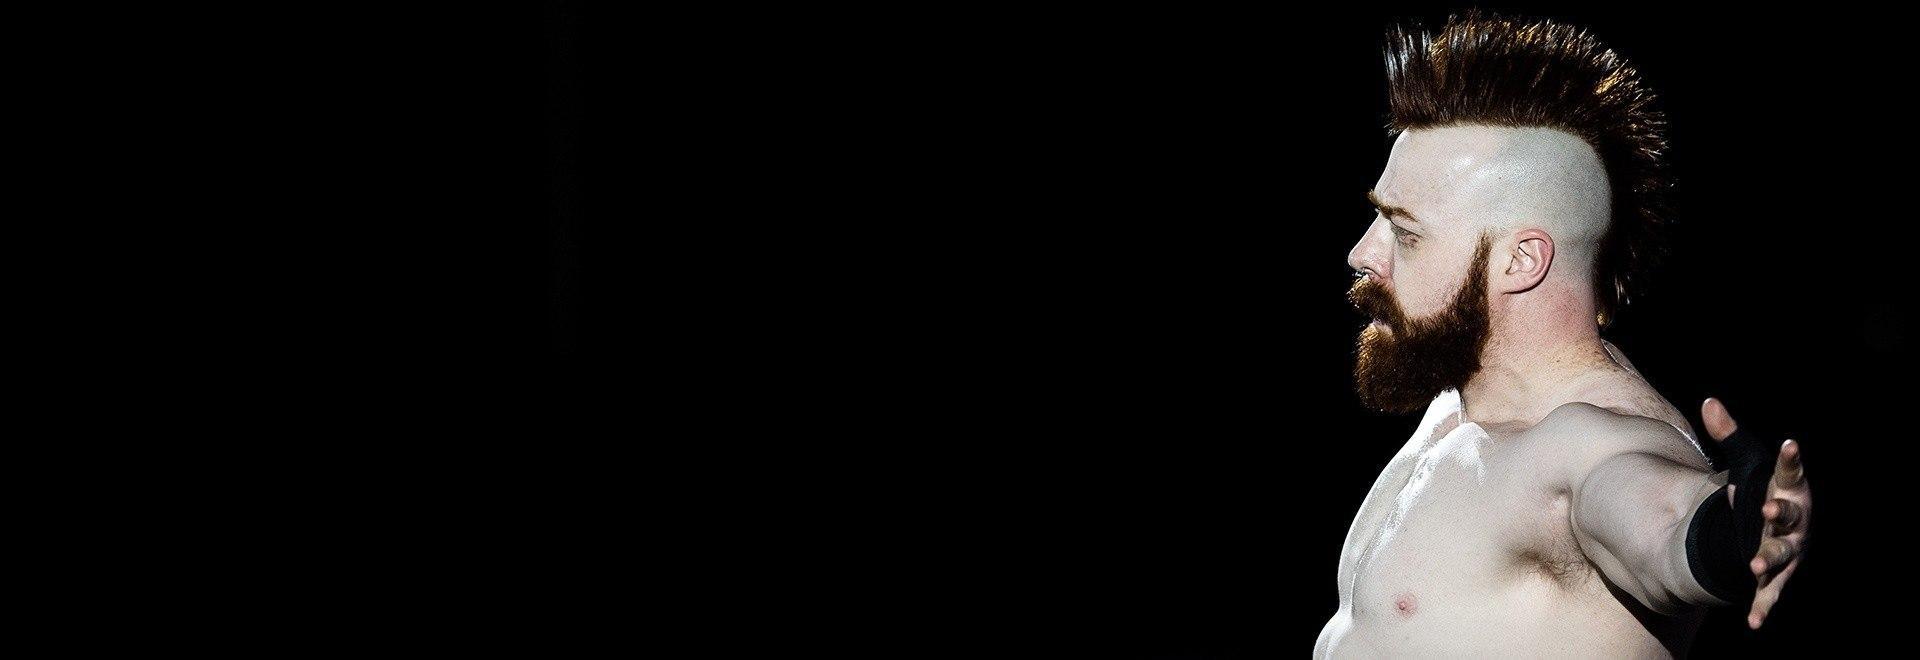 Ep. 261